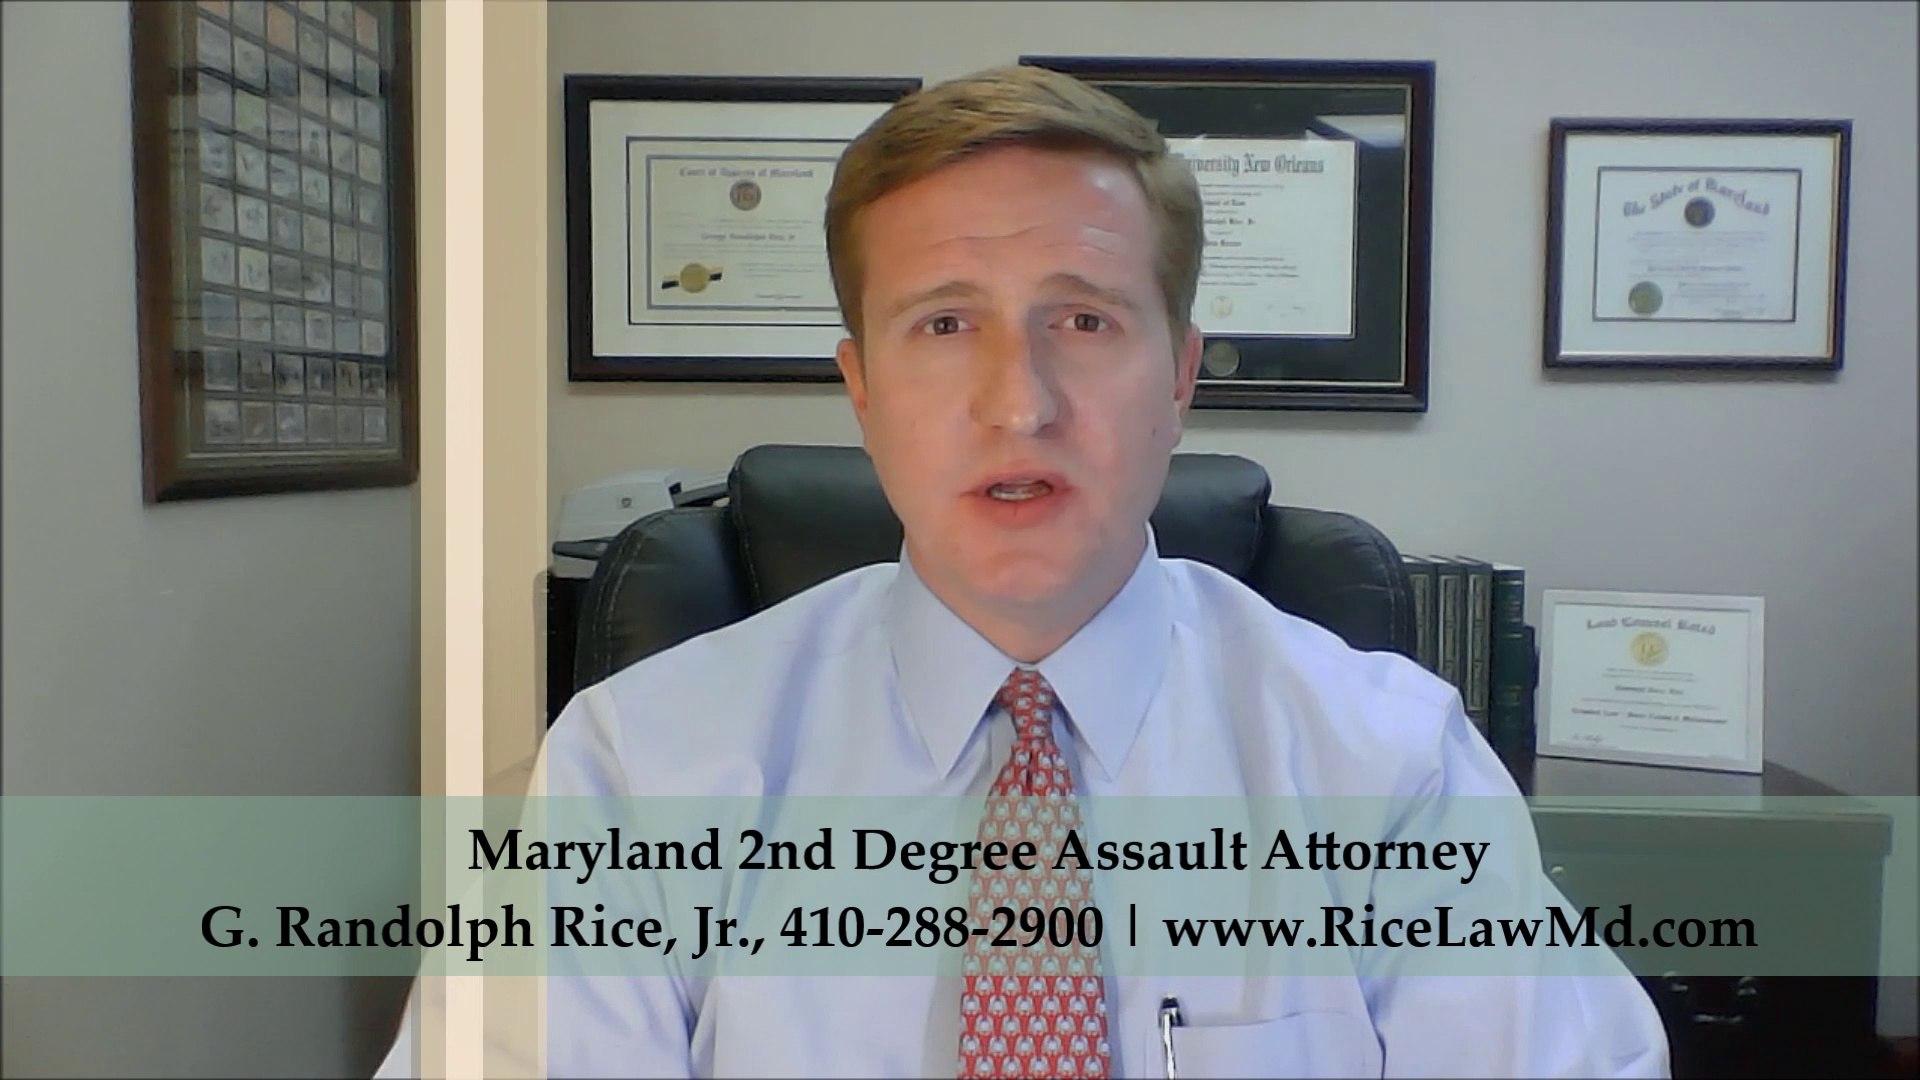 Maryland 2nd Degree Assault Law - Attorney G. Randolph Rice Jr.